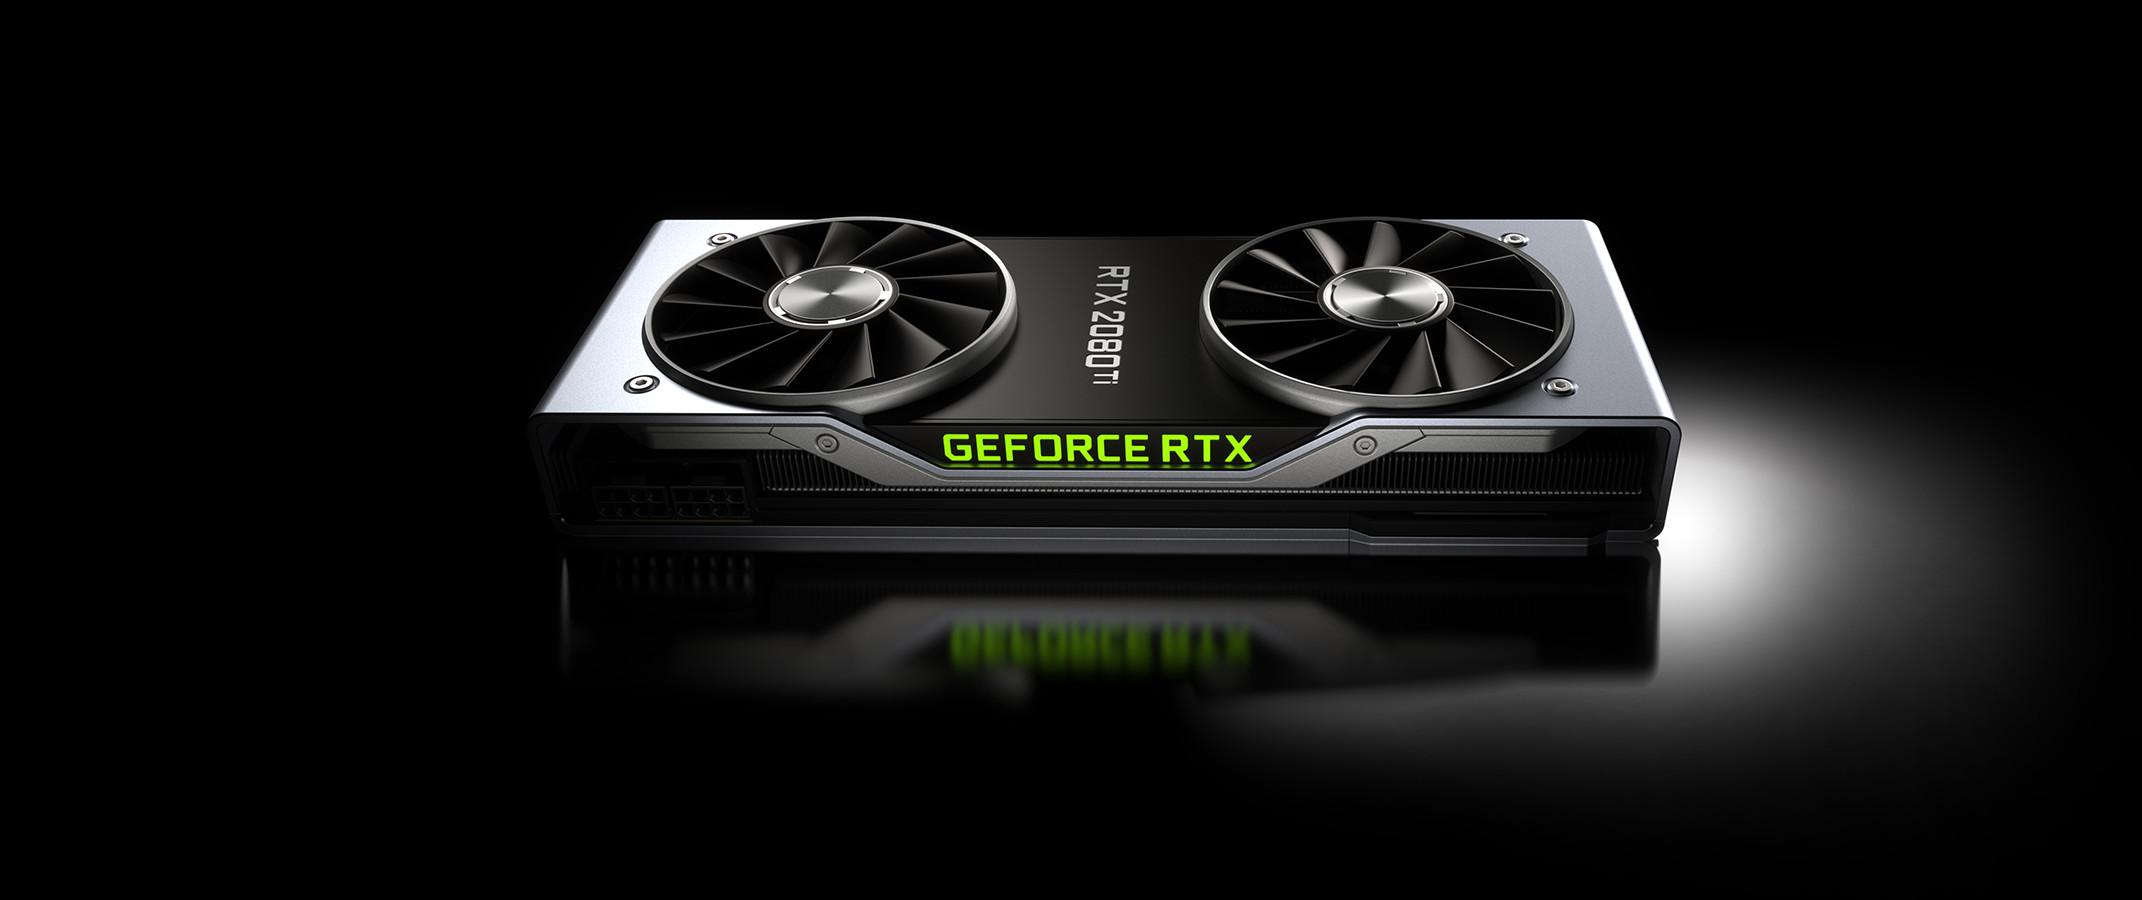 More alleged NVIDIA Ampere GPU details leak — GA103 RTX 3080 could feature 3480 CUDA cores, 320-bit memory bus, and 20 GB GDDR6 RAM giving Big Navi a headache - Notebookcheck.net